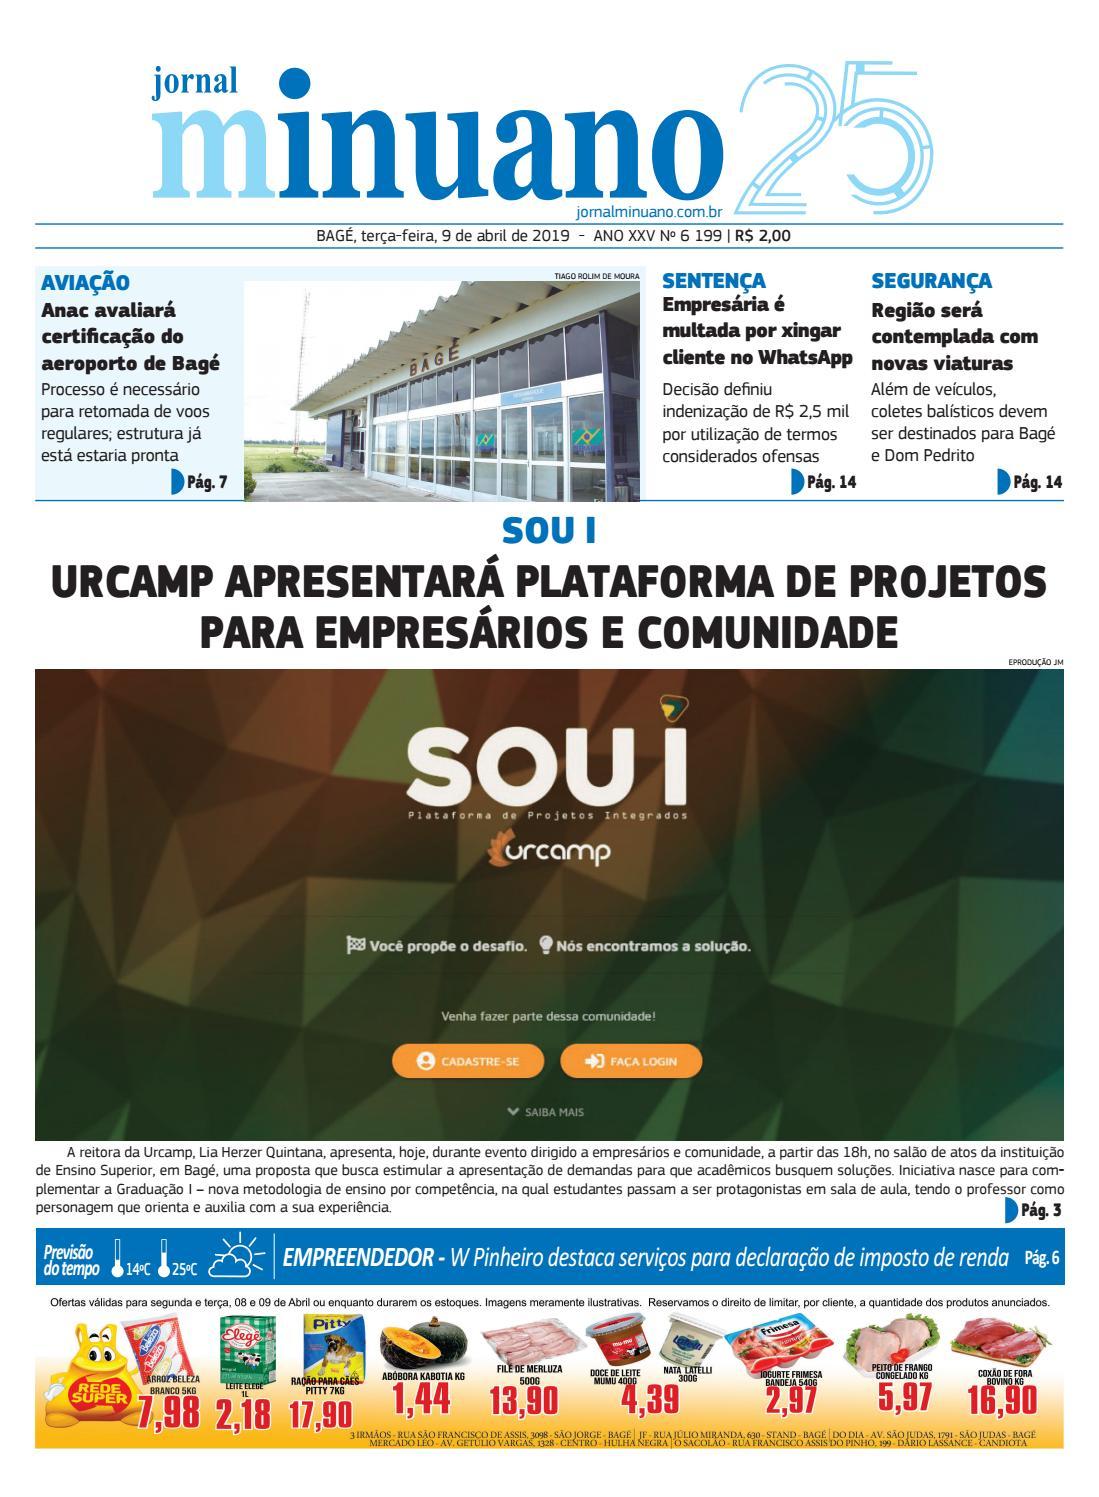 1d033f496 Jornal Minuano - 9 de abril de 2019 by Jornal Minuano - issuu